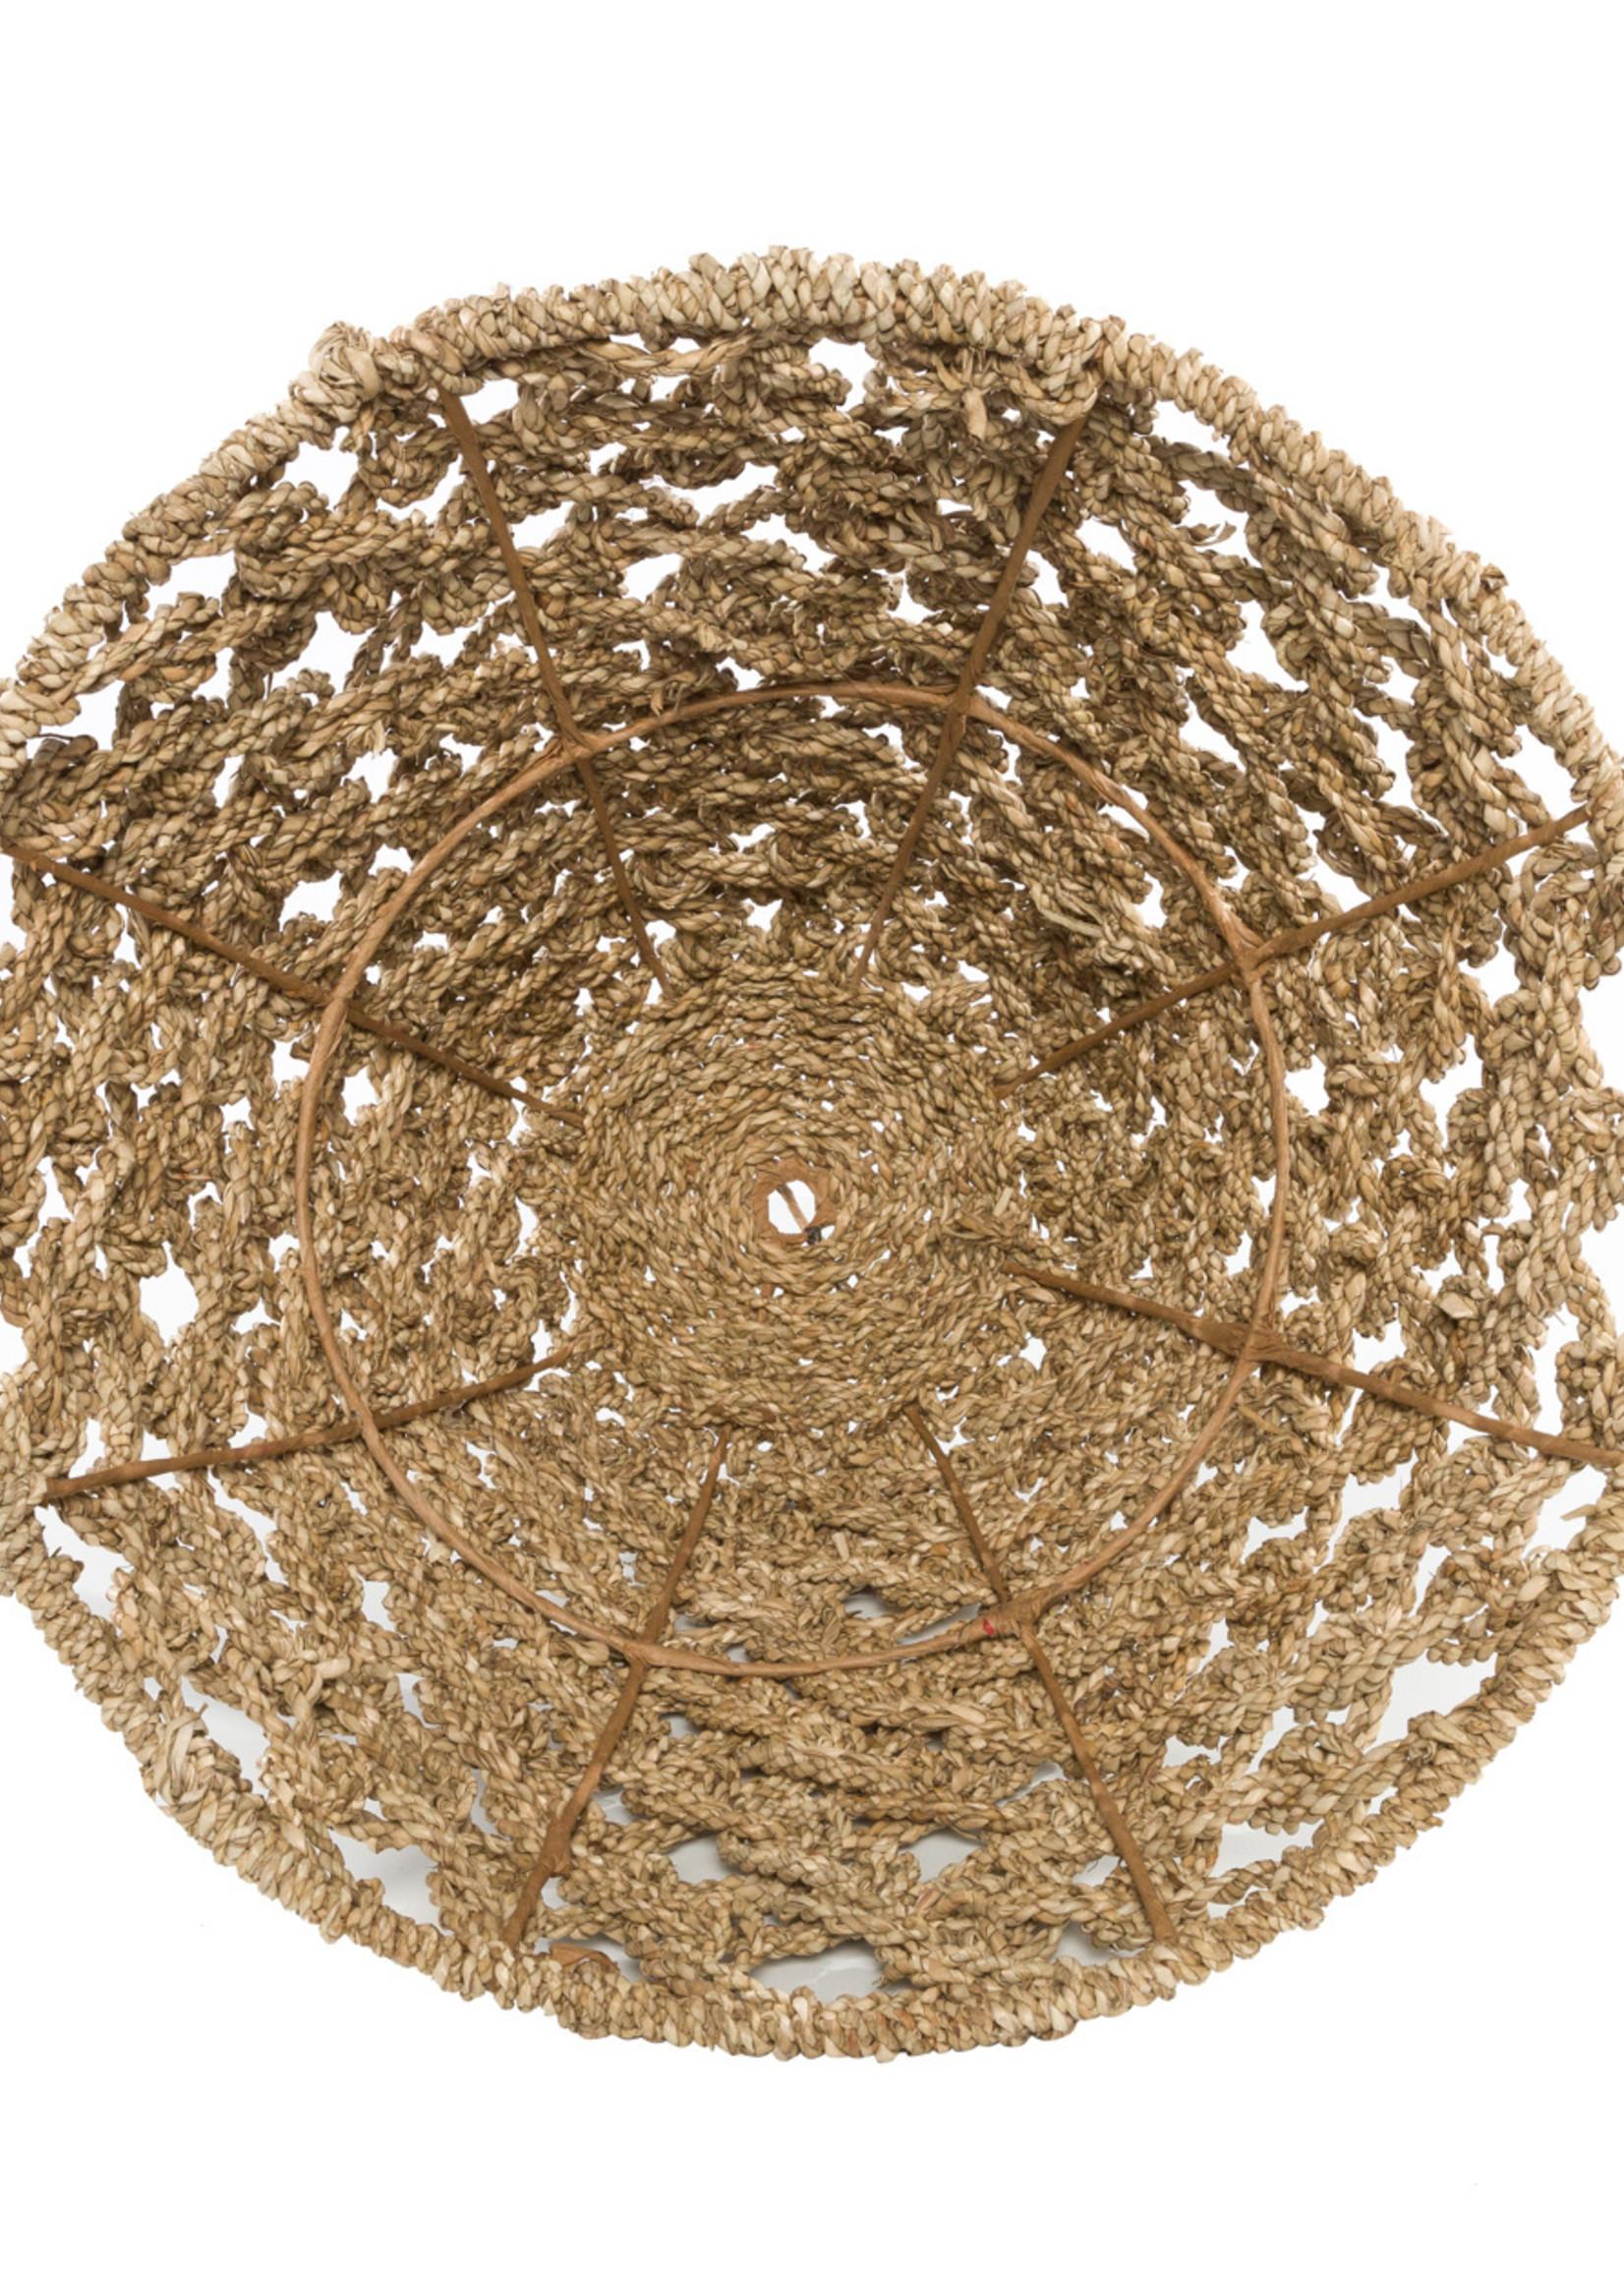 The Seagrass Pendant - Natural - Medium